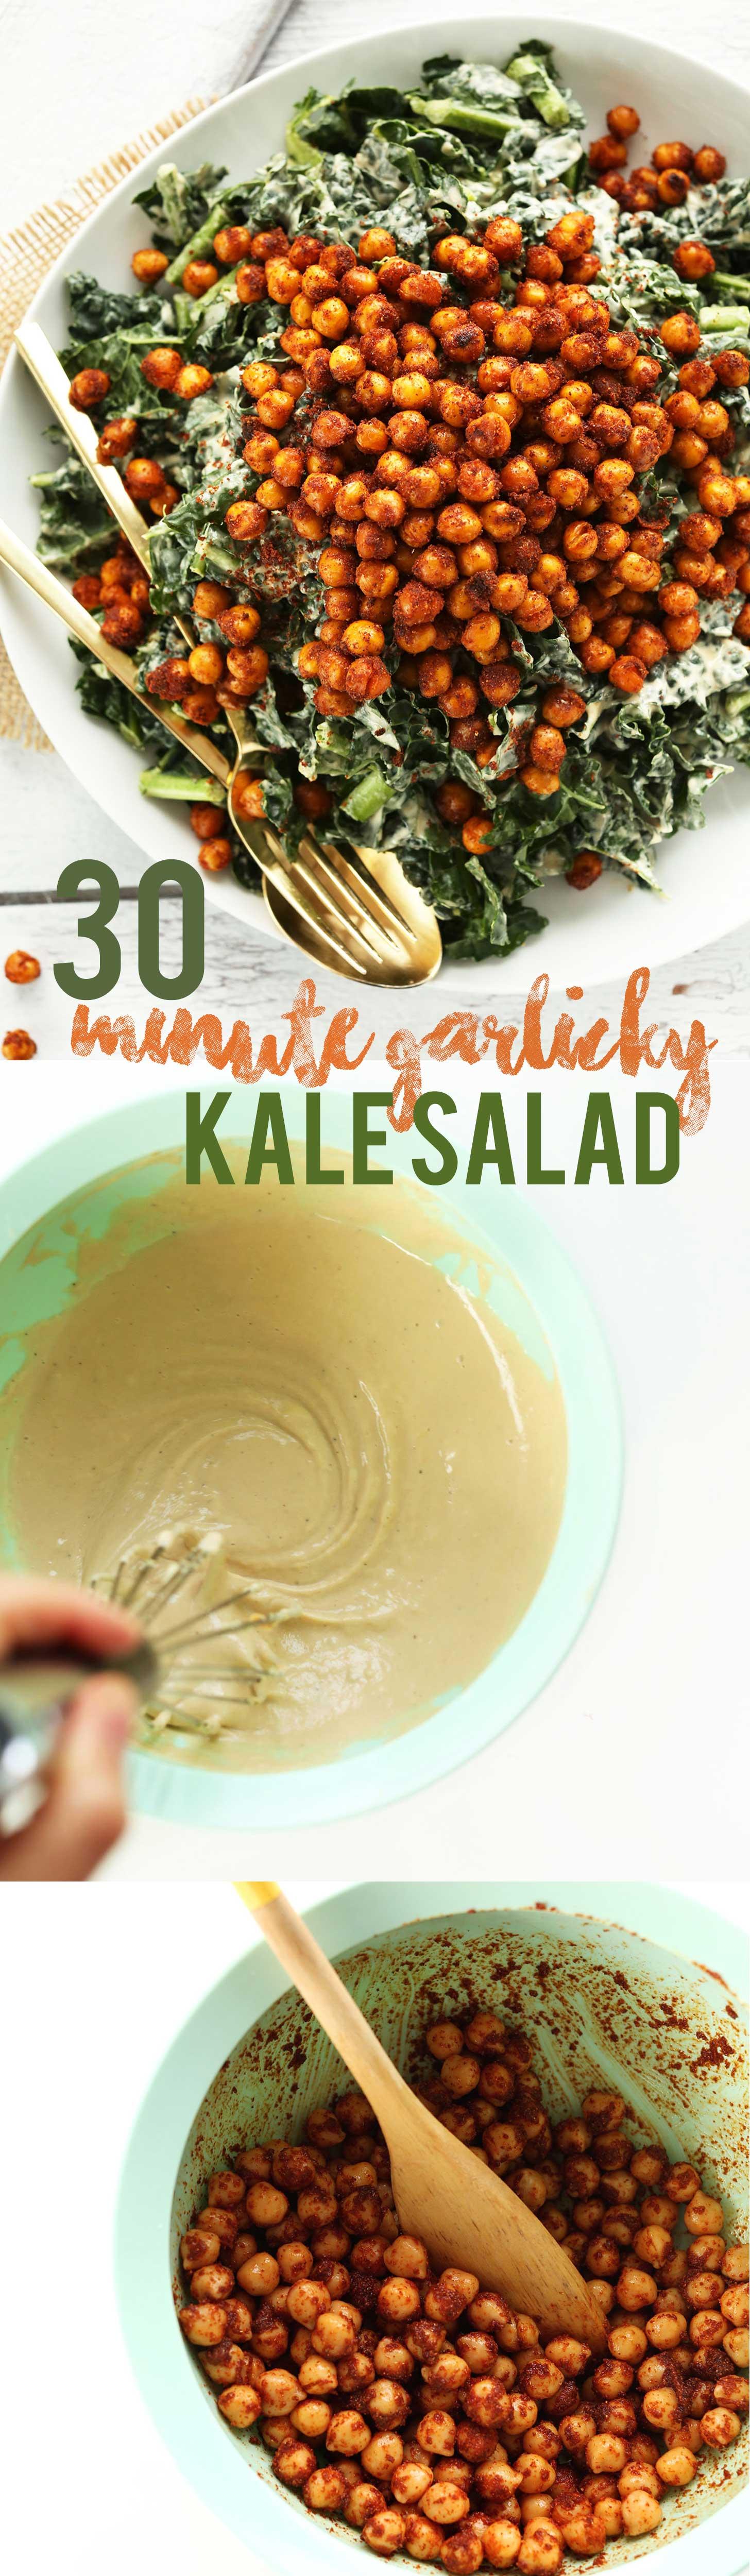 AMAZING 30 minute Garlicky Kale Salad with Crispy Chickpeas! #vegan #glutenfree #plantbased